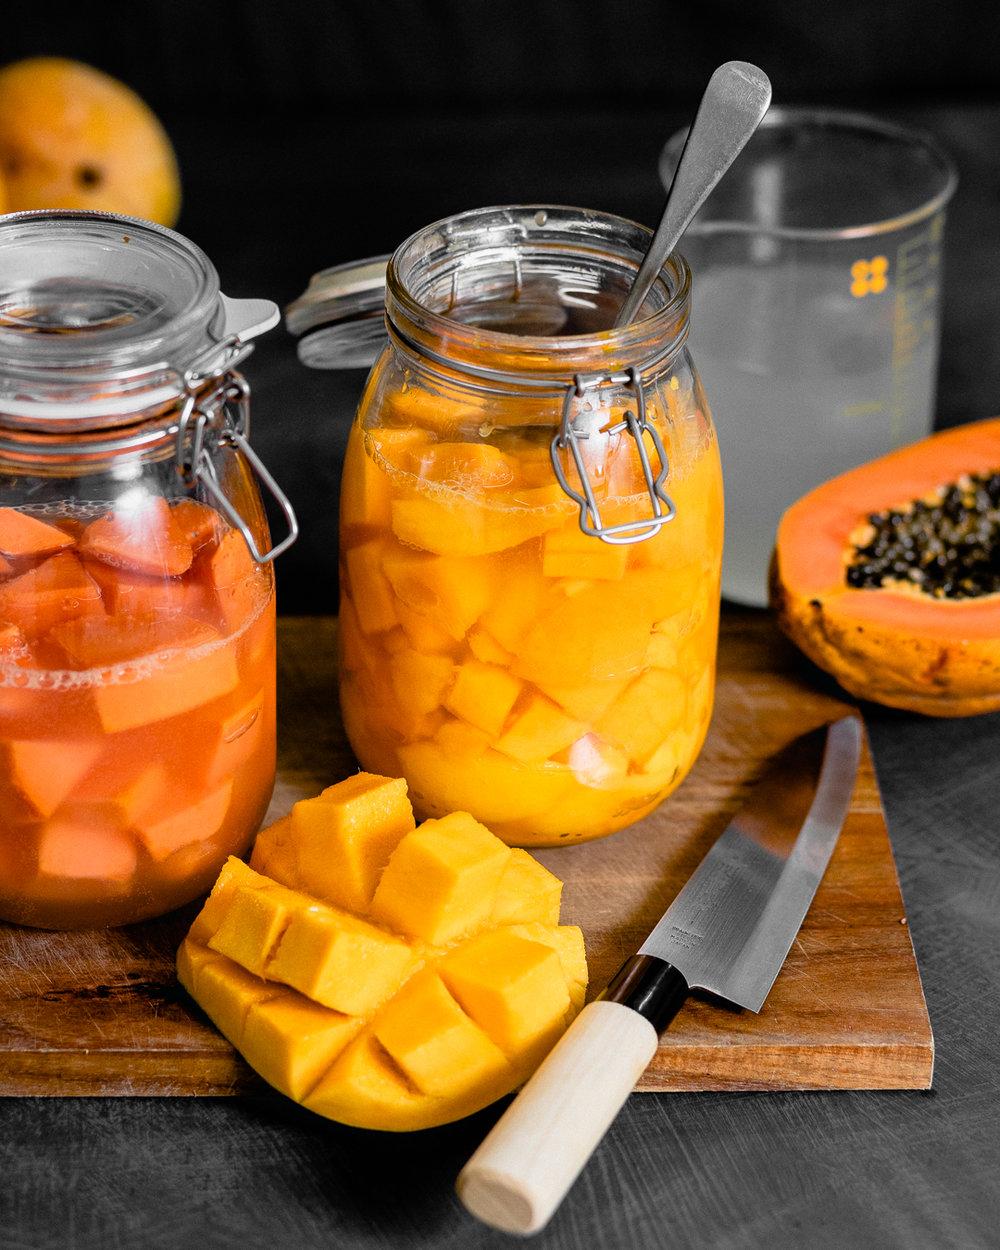 Fermented_Papaya_and_Mango_by_Jordan_Pie_Nutritionist_Photographer-5.jpg